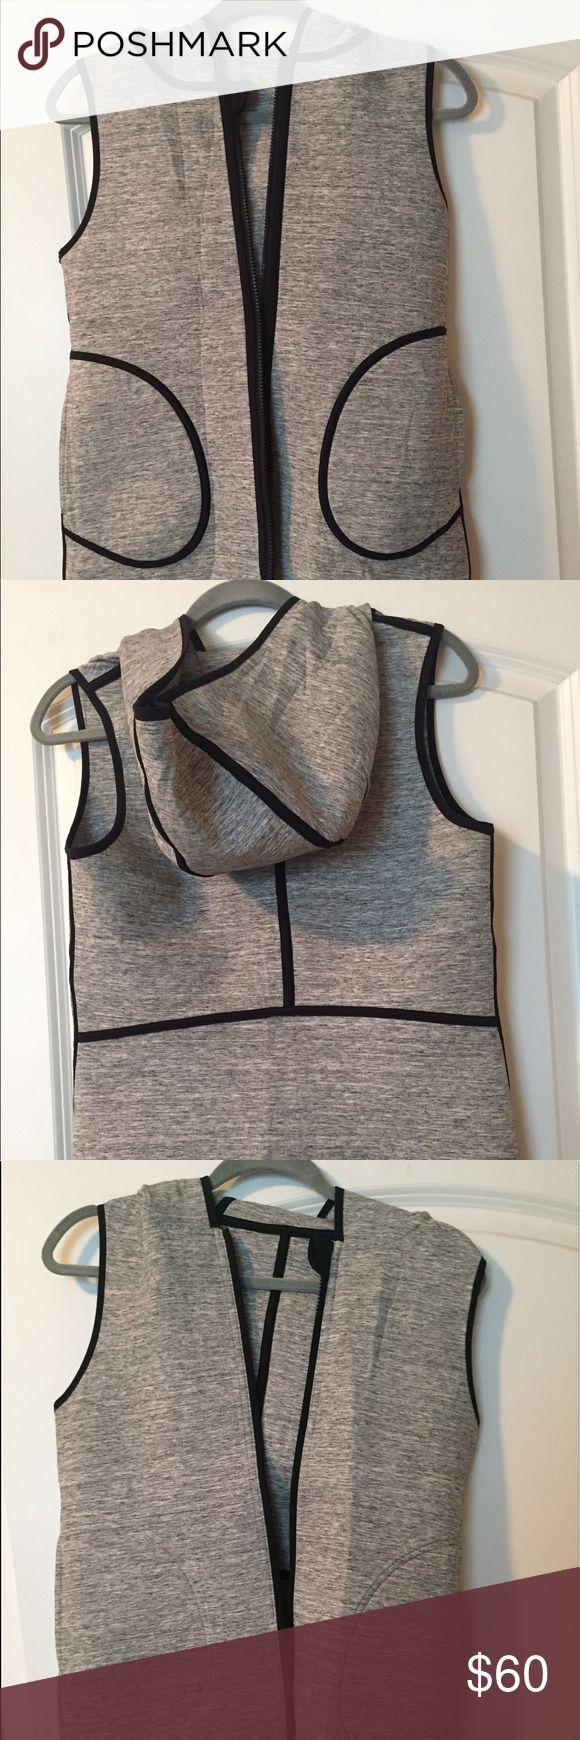 Lululemon vest. Fully reversible. Lululemon vest. Fully reversible, with pockets and hood. Black seems on one side, fully gray on the other. lululemon athletica Jackets & Coats Vests